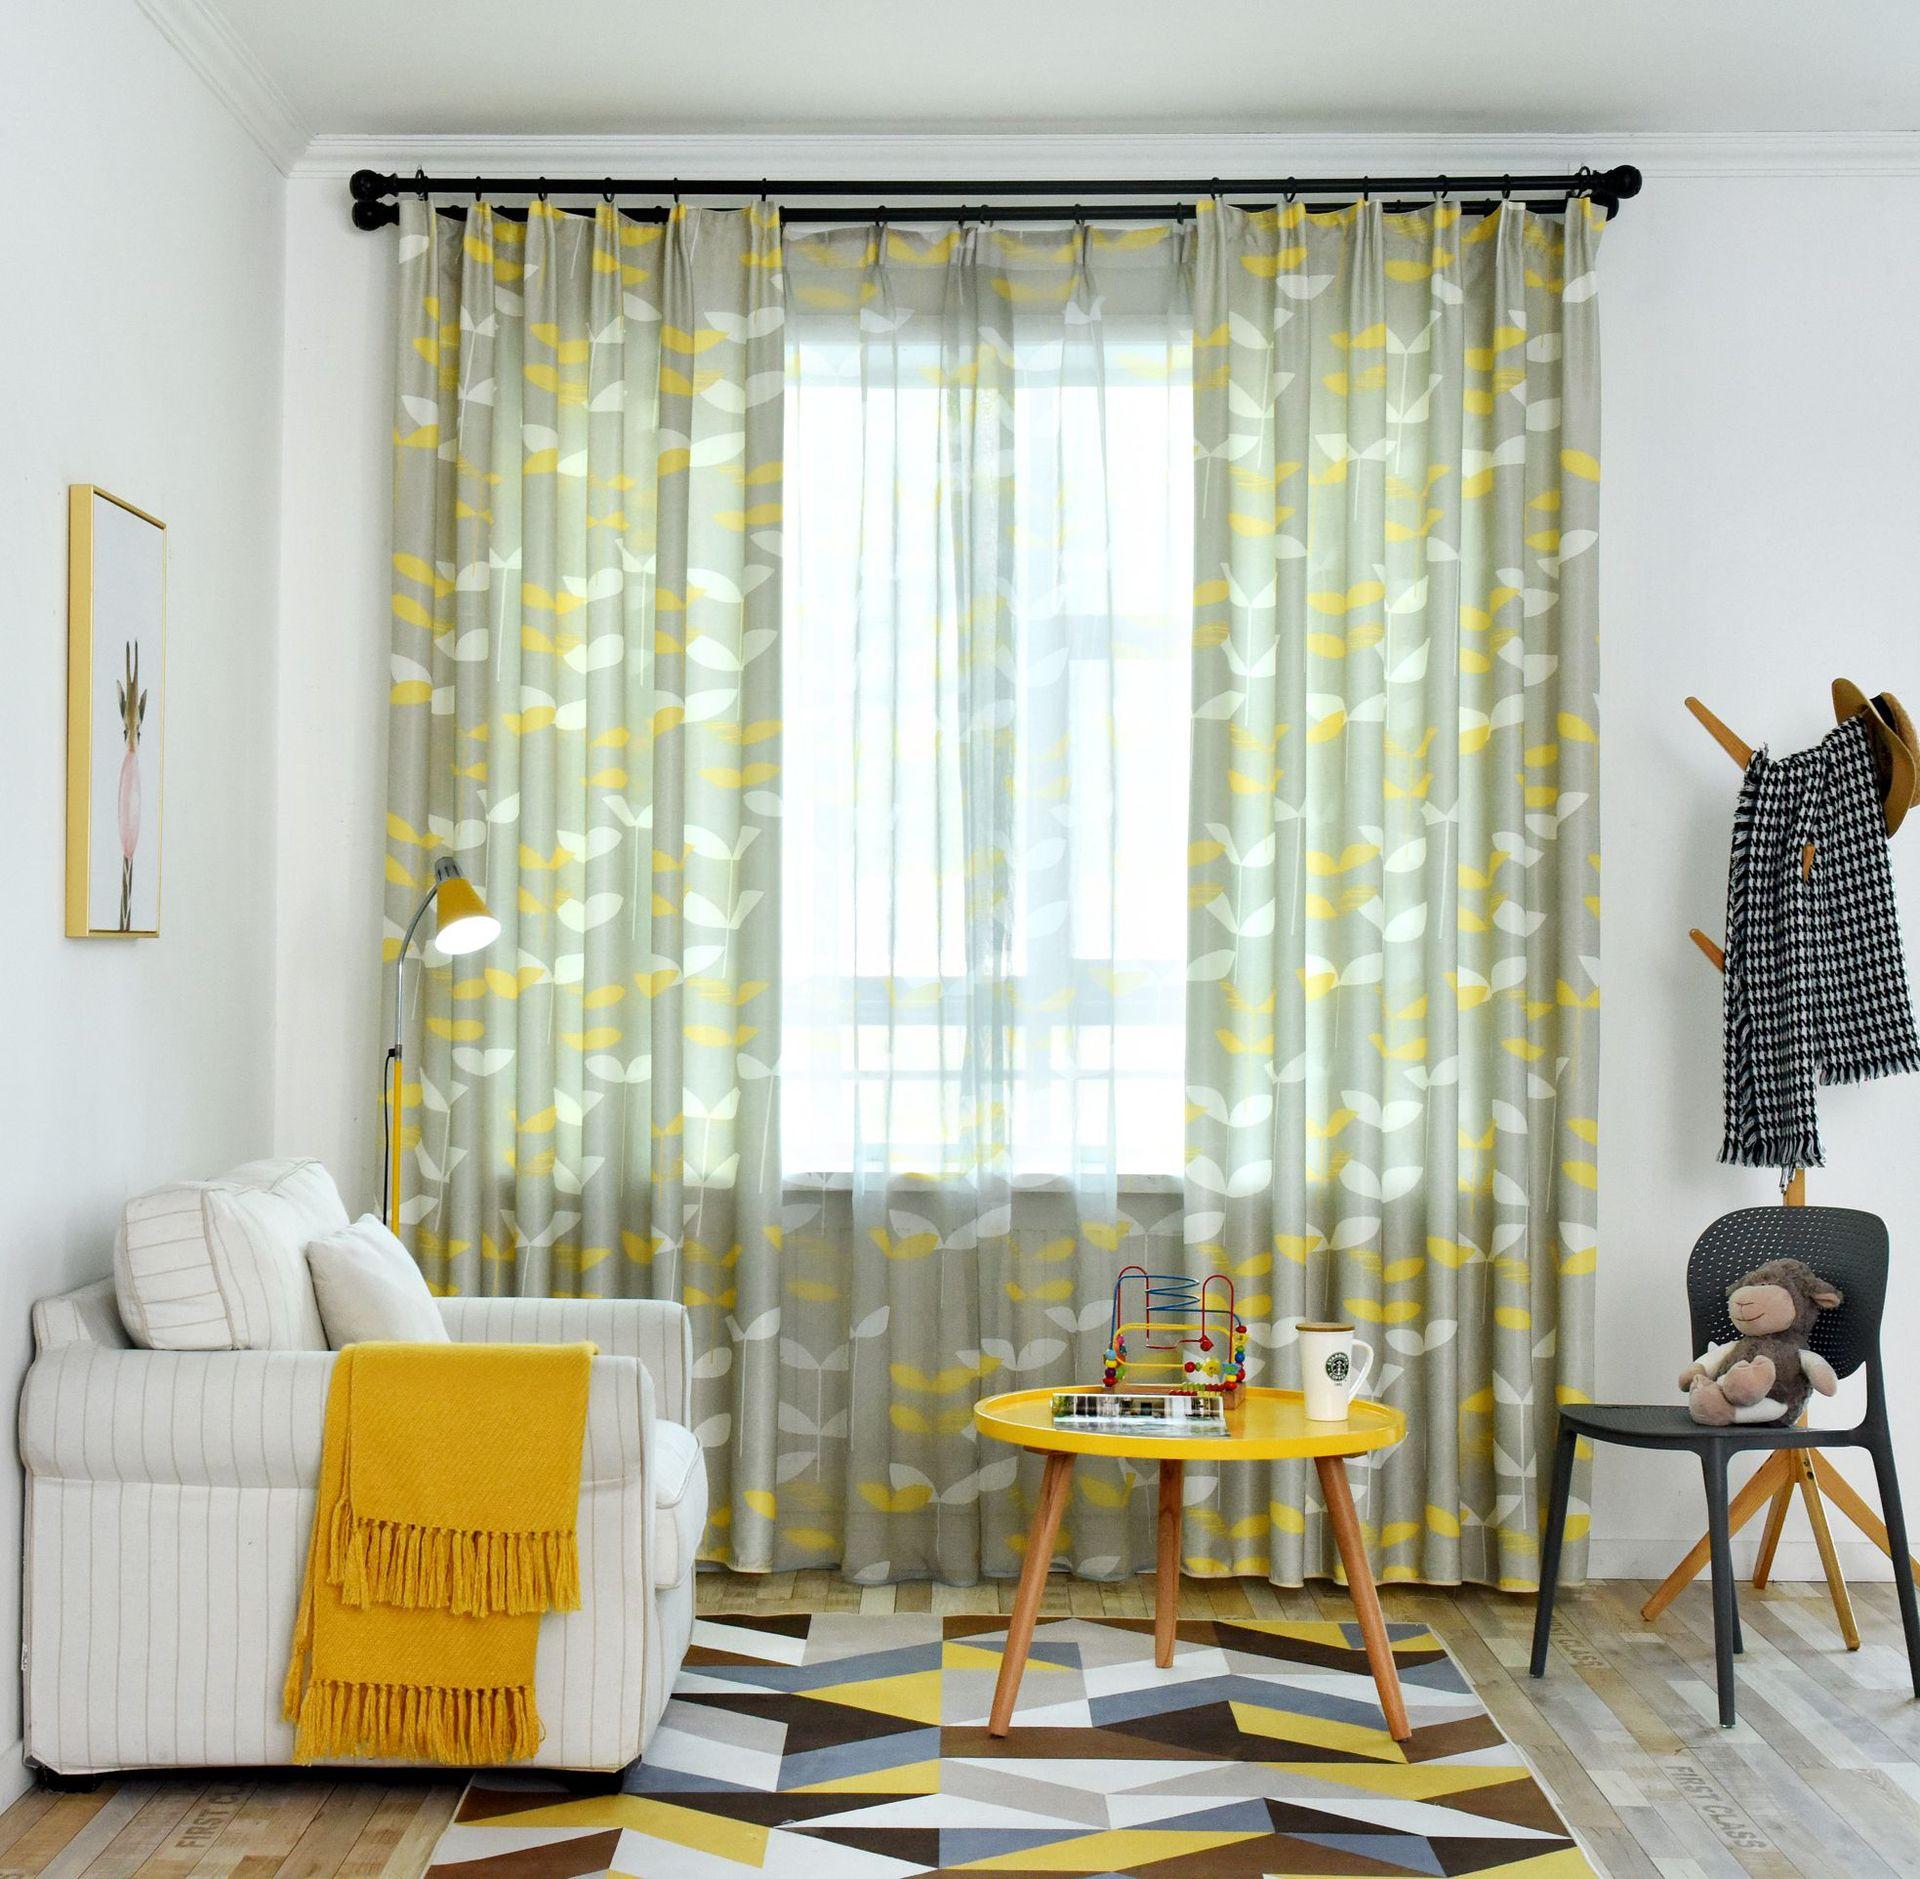 Scandinavian Large Leaf Curtains Finished Shade Cloth Modern Bedroom, Floating Window Living Room Floor Window Flat Window